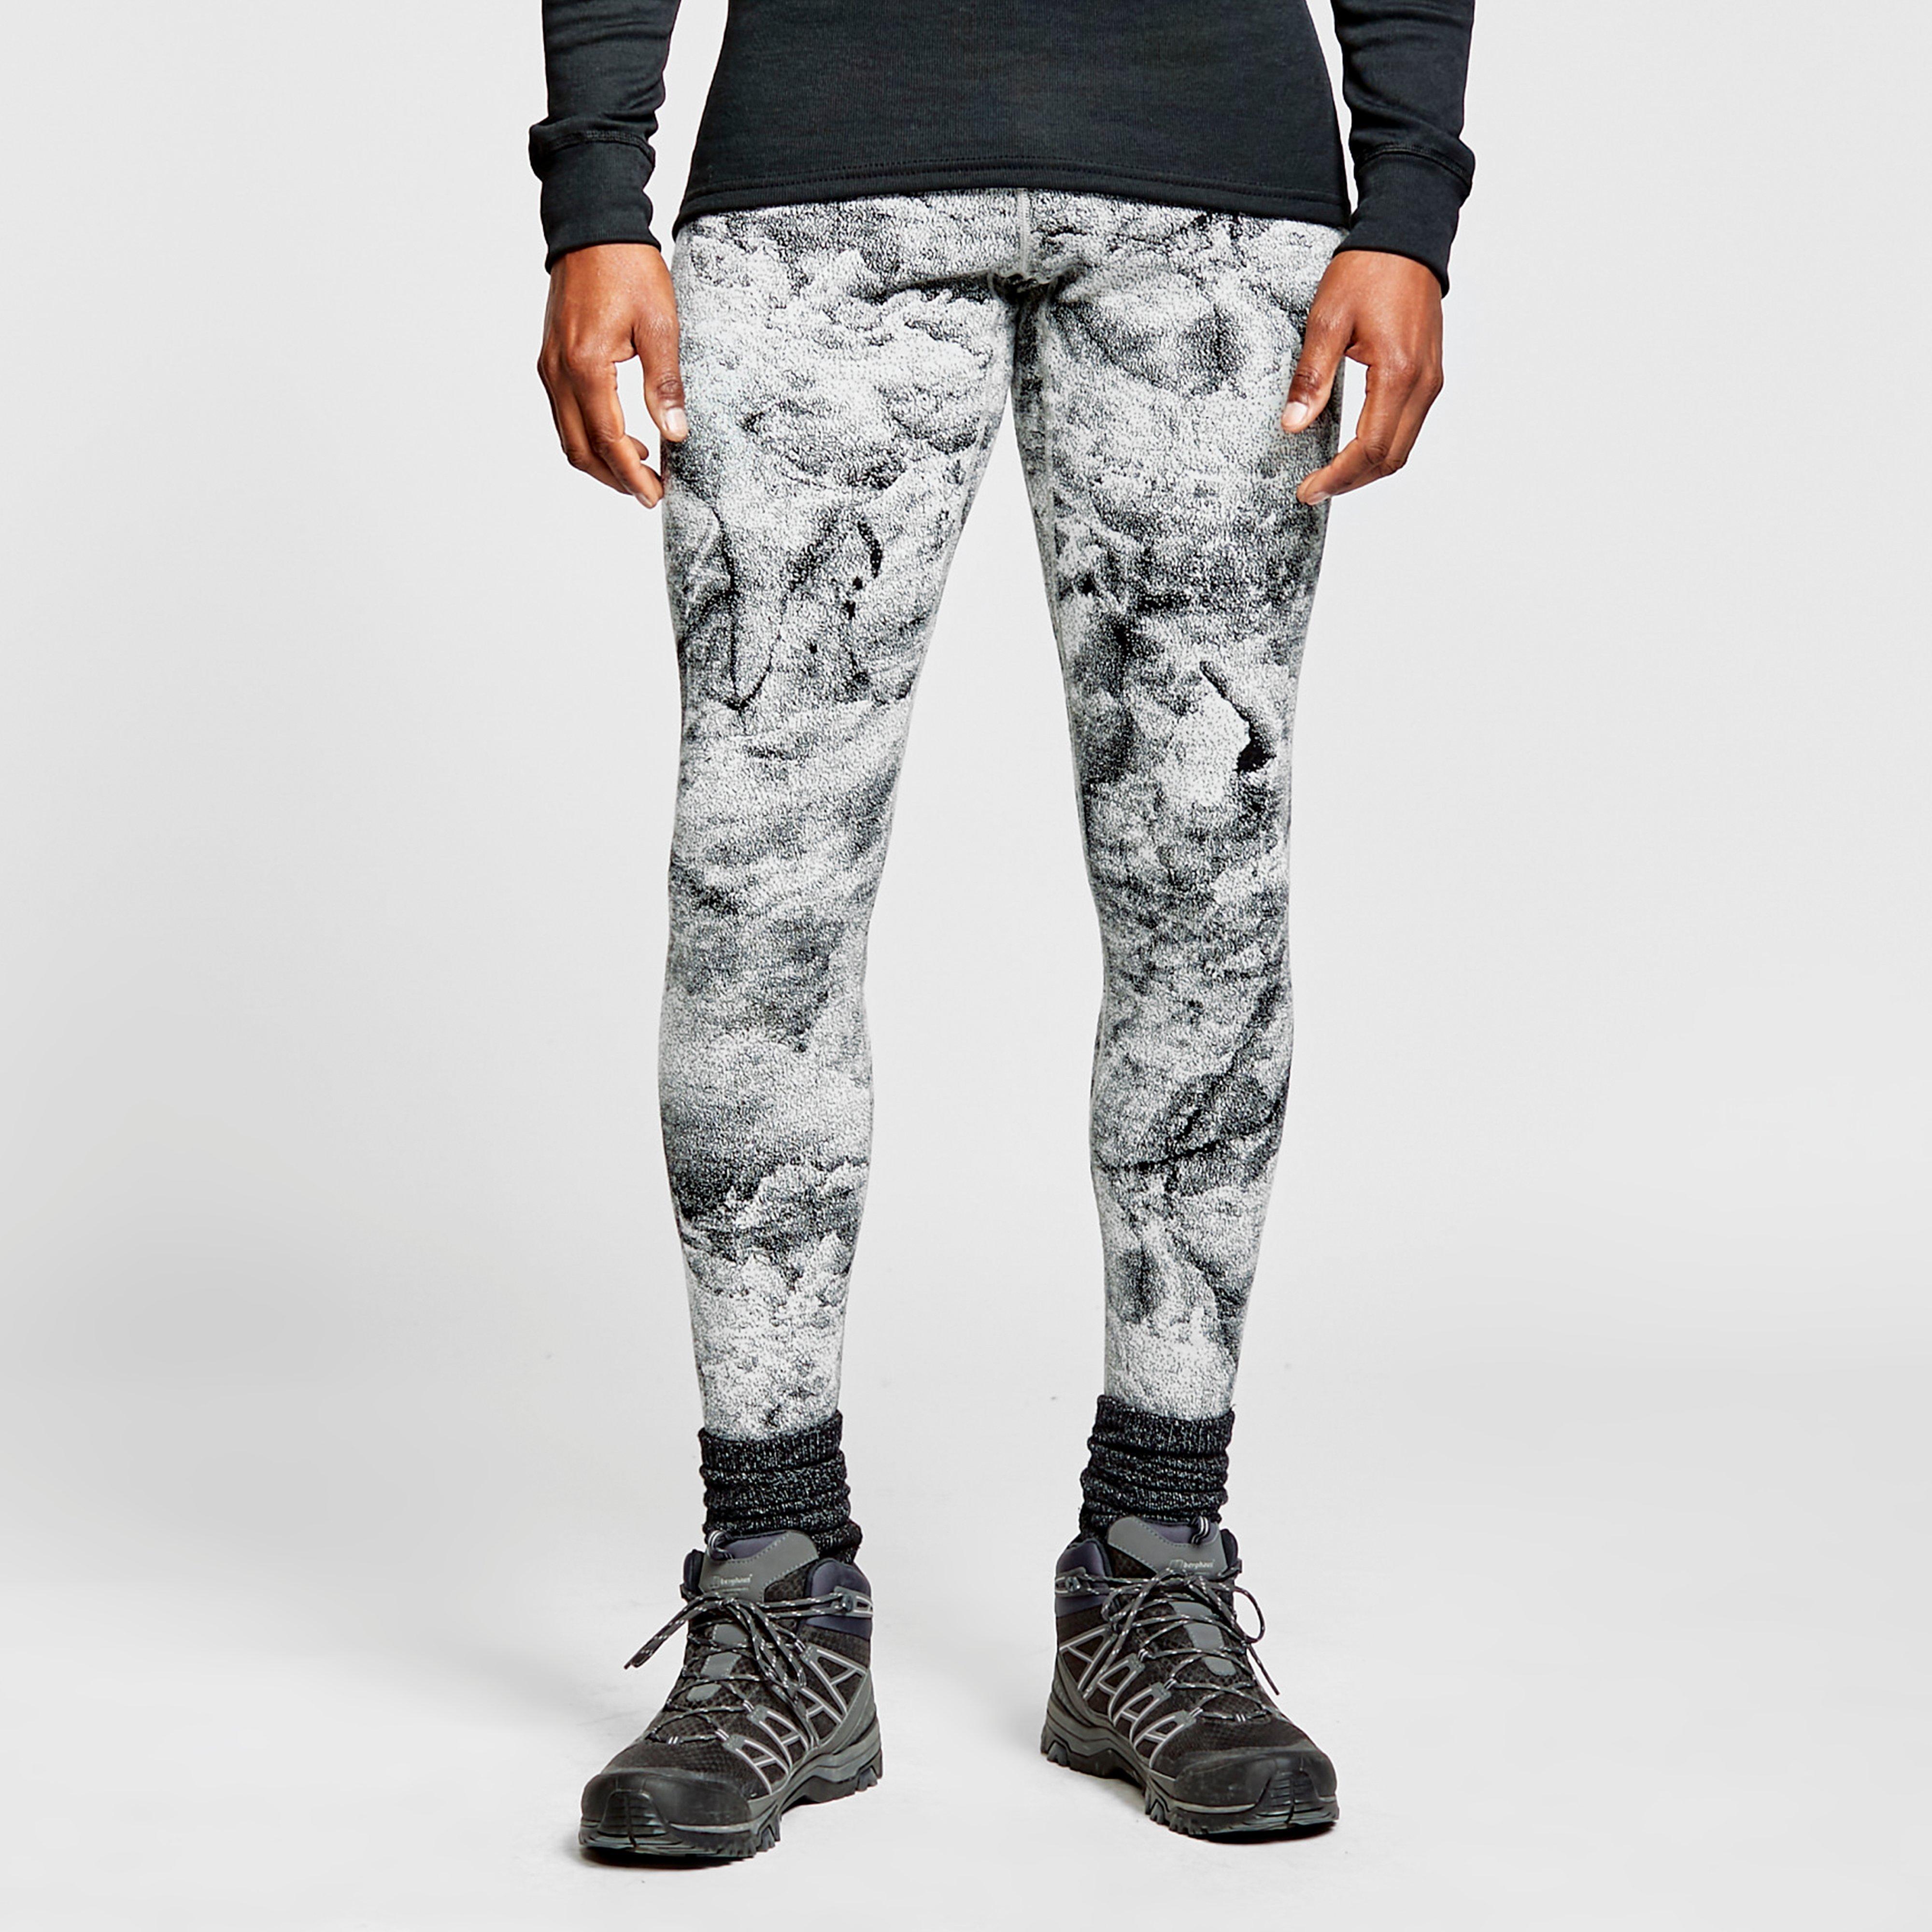 Image of Icebreaker Men's Merino 250 Vertex Baselayer Pant - Camo/White, Camo/White